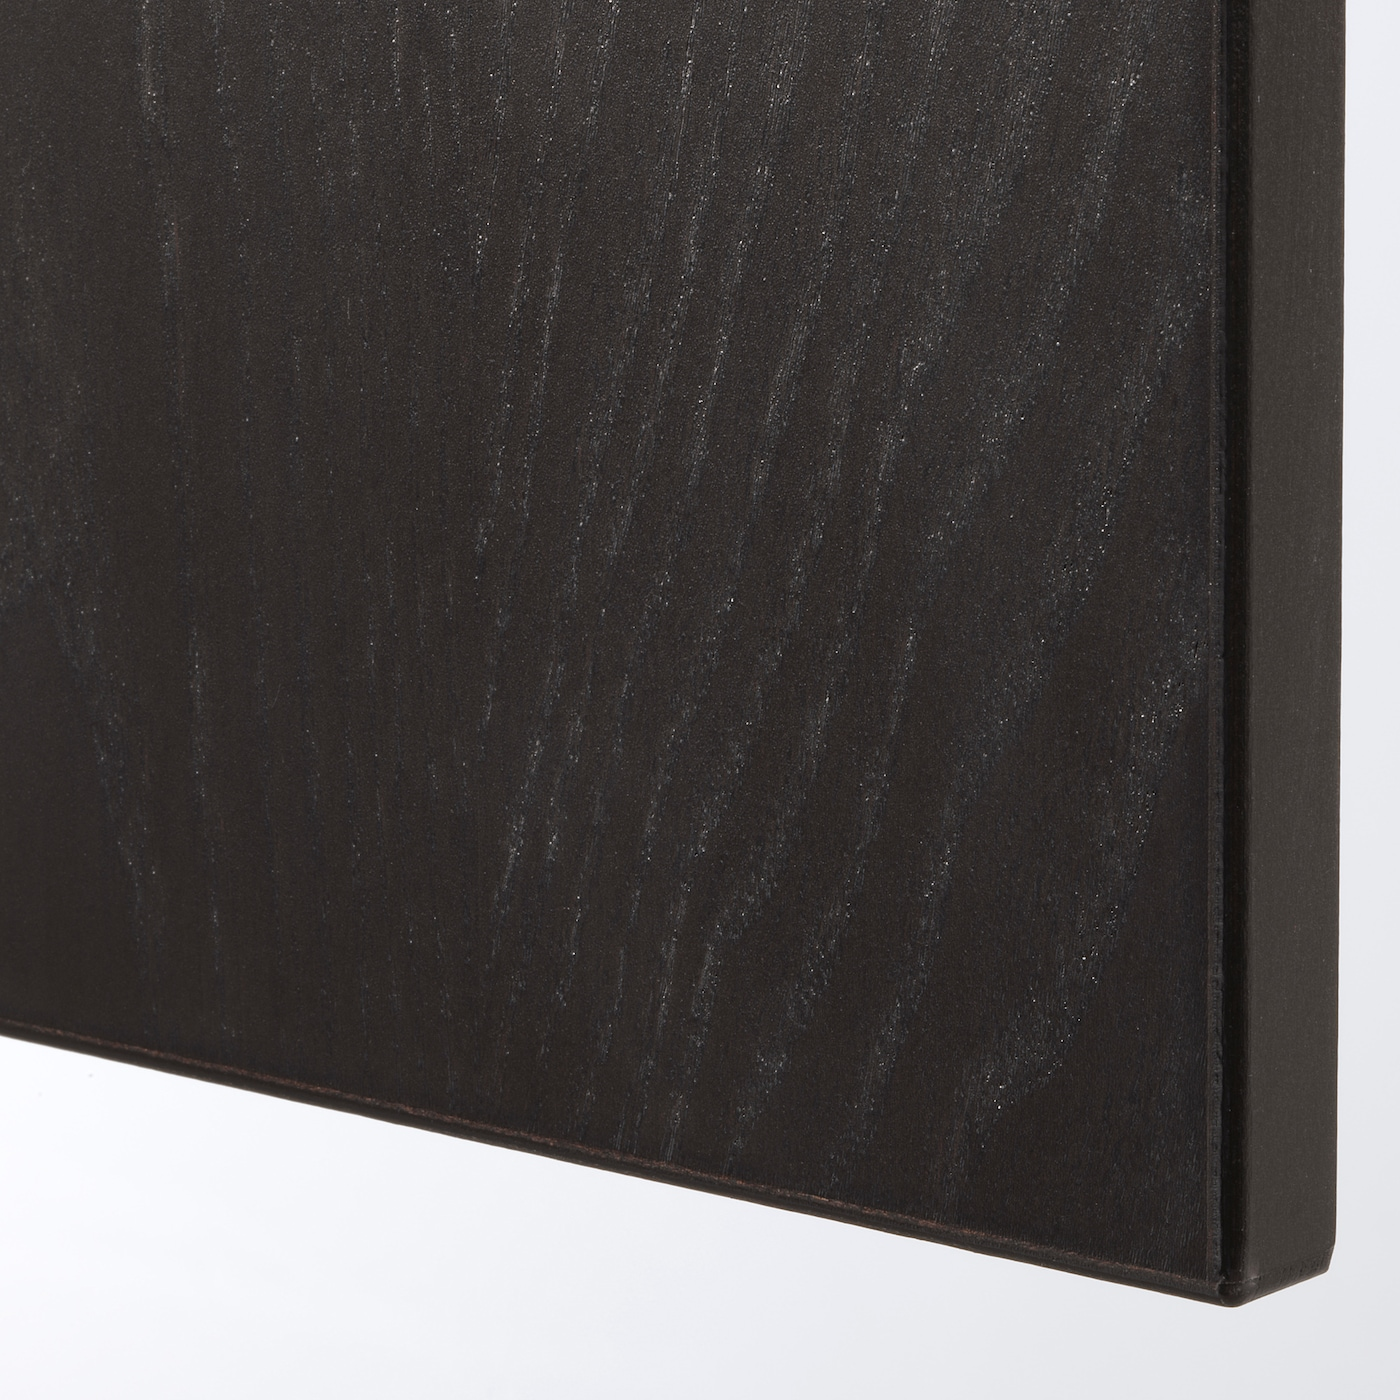 Pax Forsand Vikedal Wardrobe Combination Black Brown Mirror